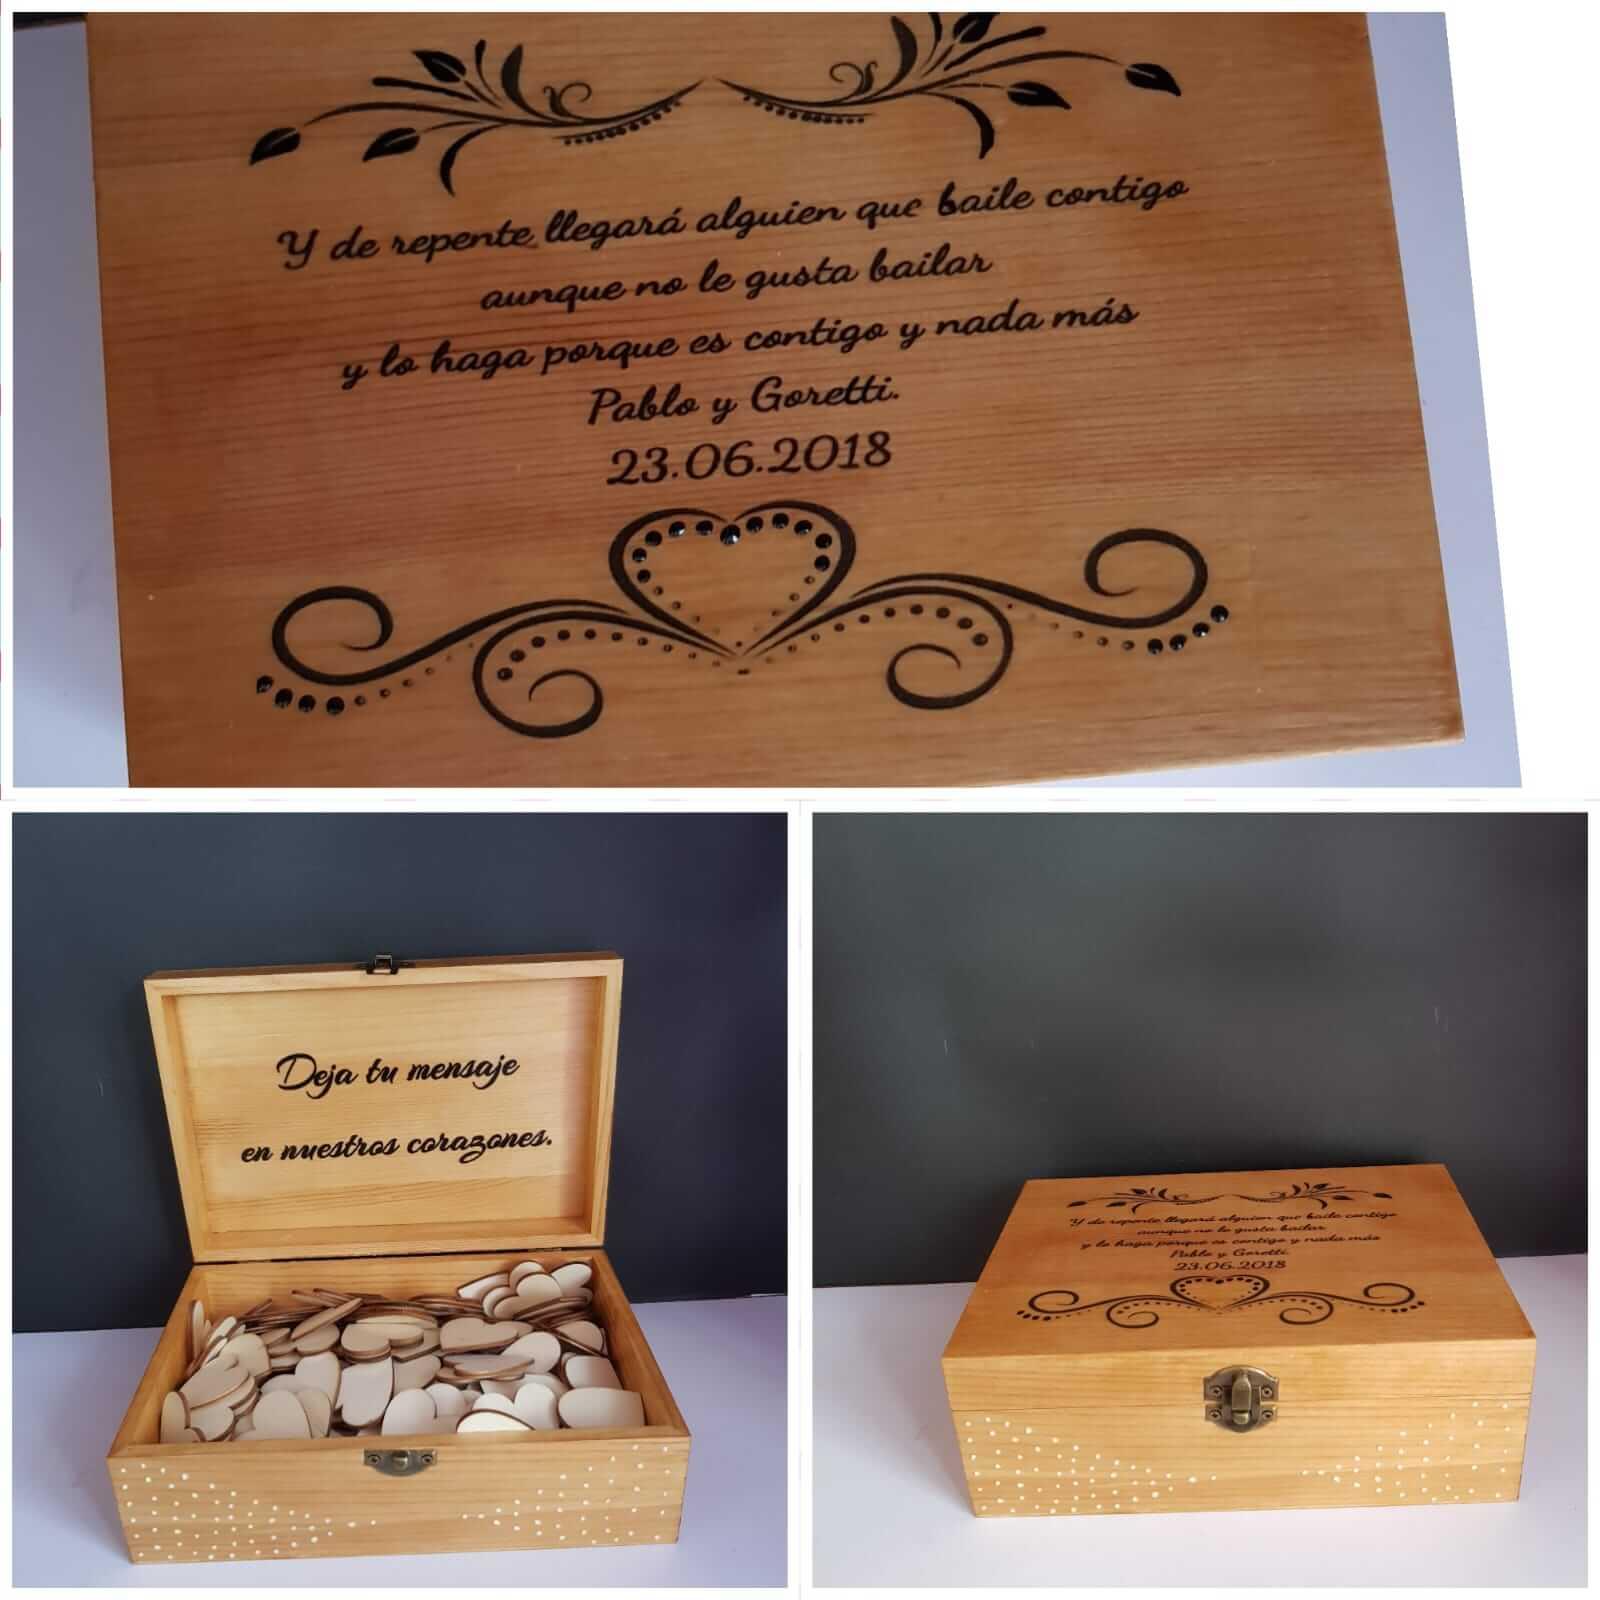 Caja de madera para libro de firmas caja de madera para libro de firmas - Caja de madera para libro de firmas 3 - Caja de madera para libro de firmas